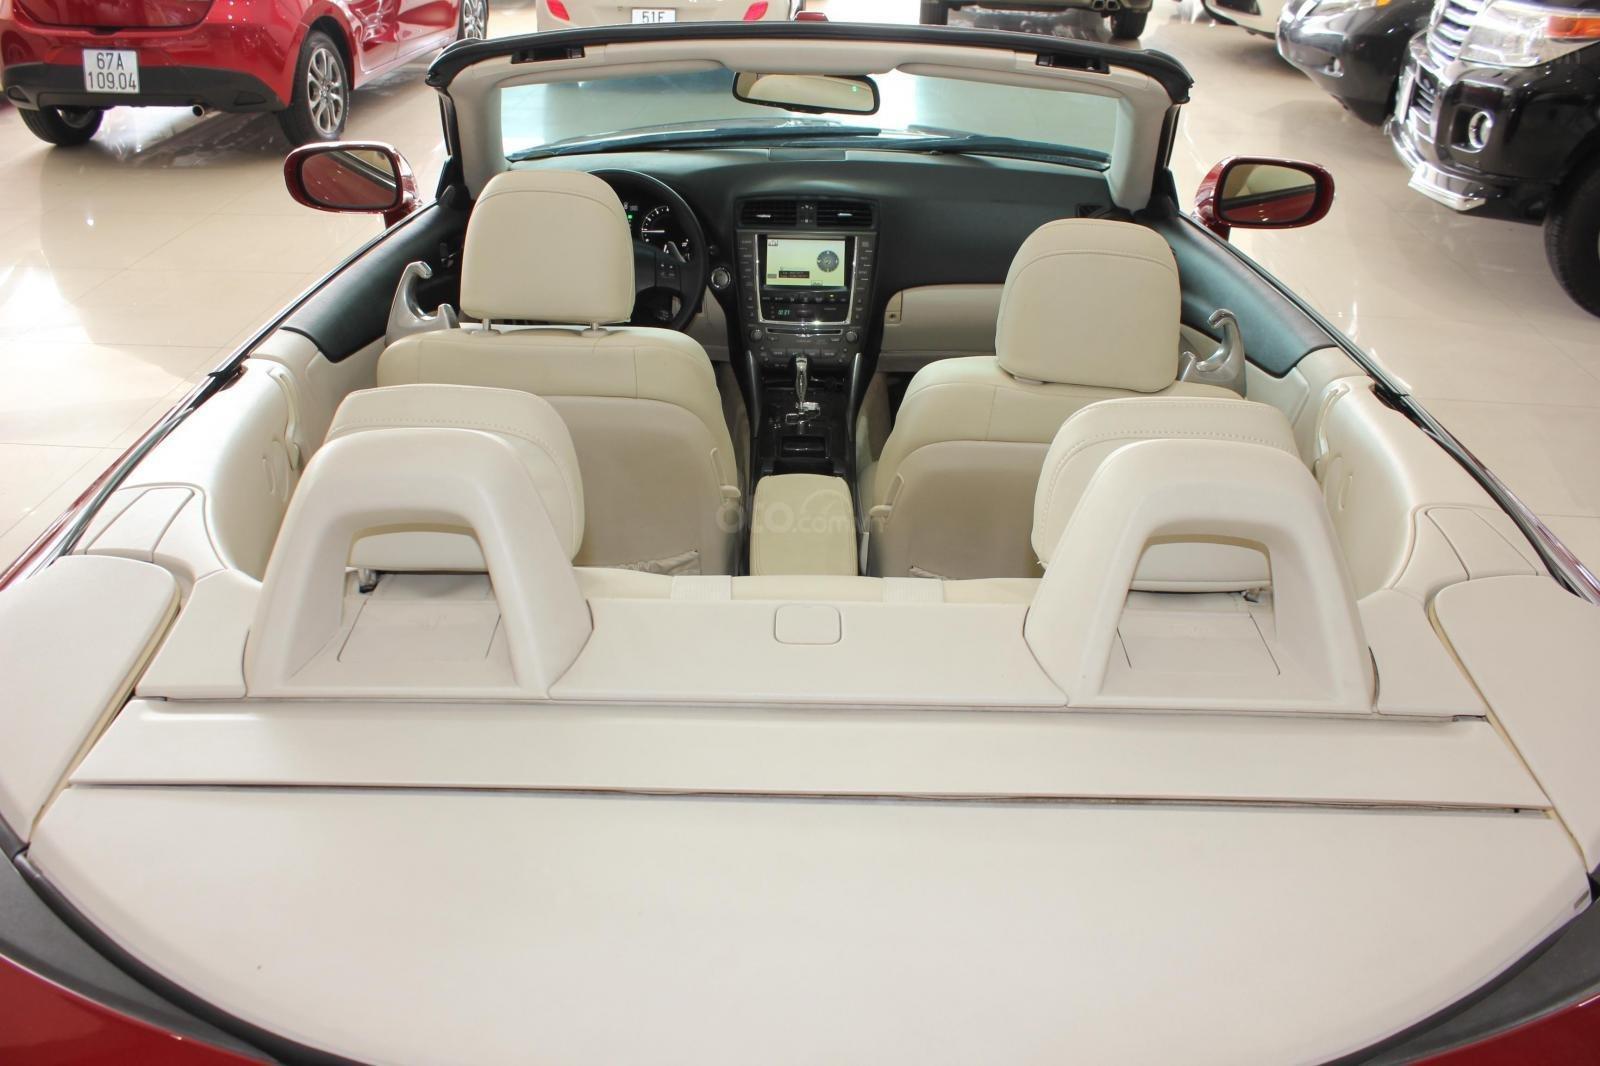 Bán Lexus IS 250 sx 2010, màu đỏ, xe nhập (16)